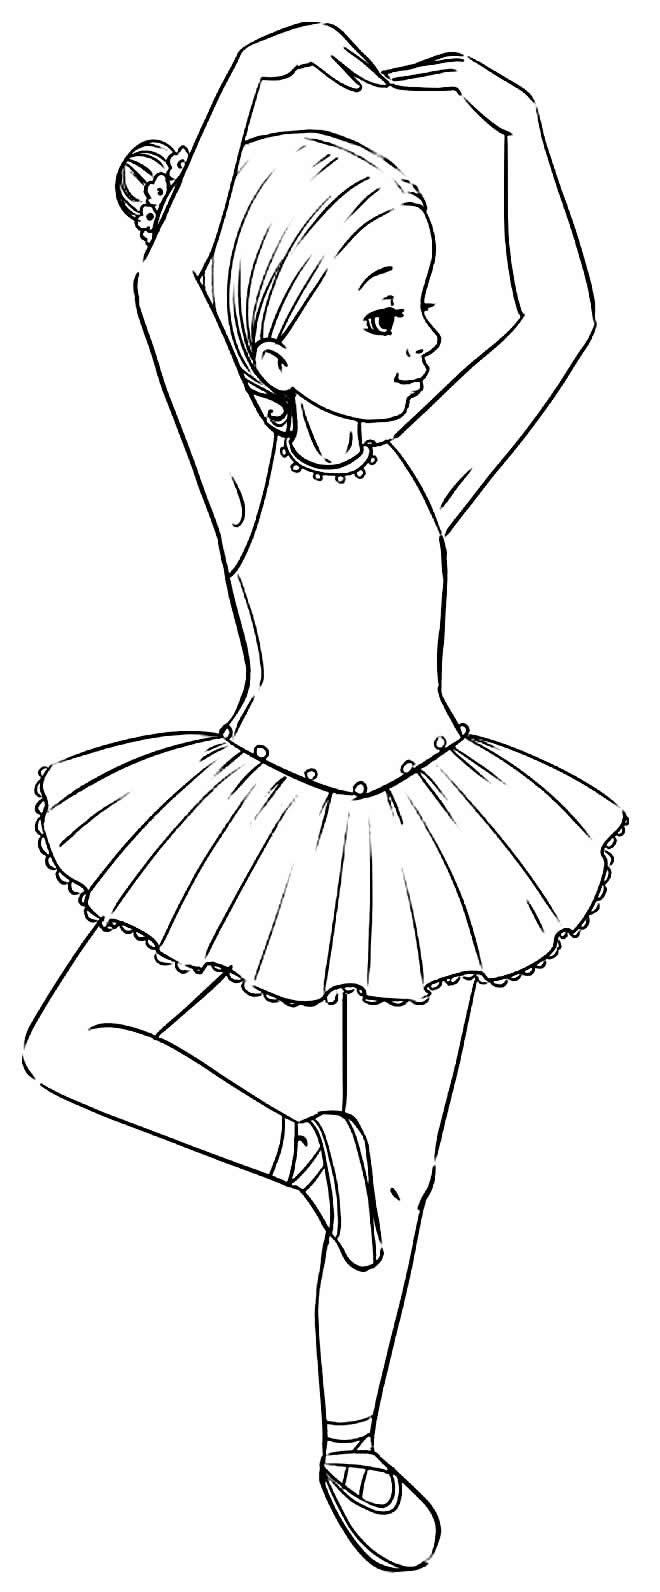 Desenho de Bailarina fofa para colorir